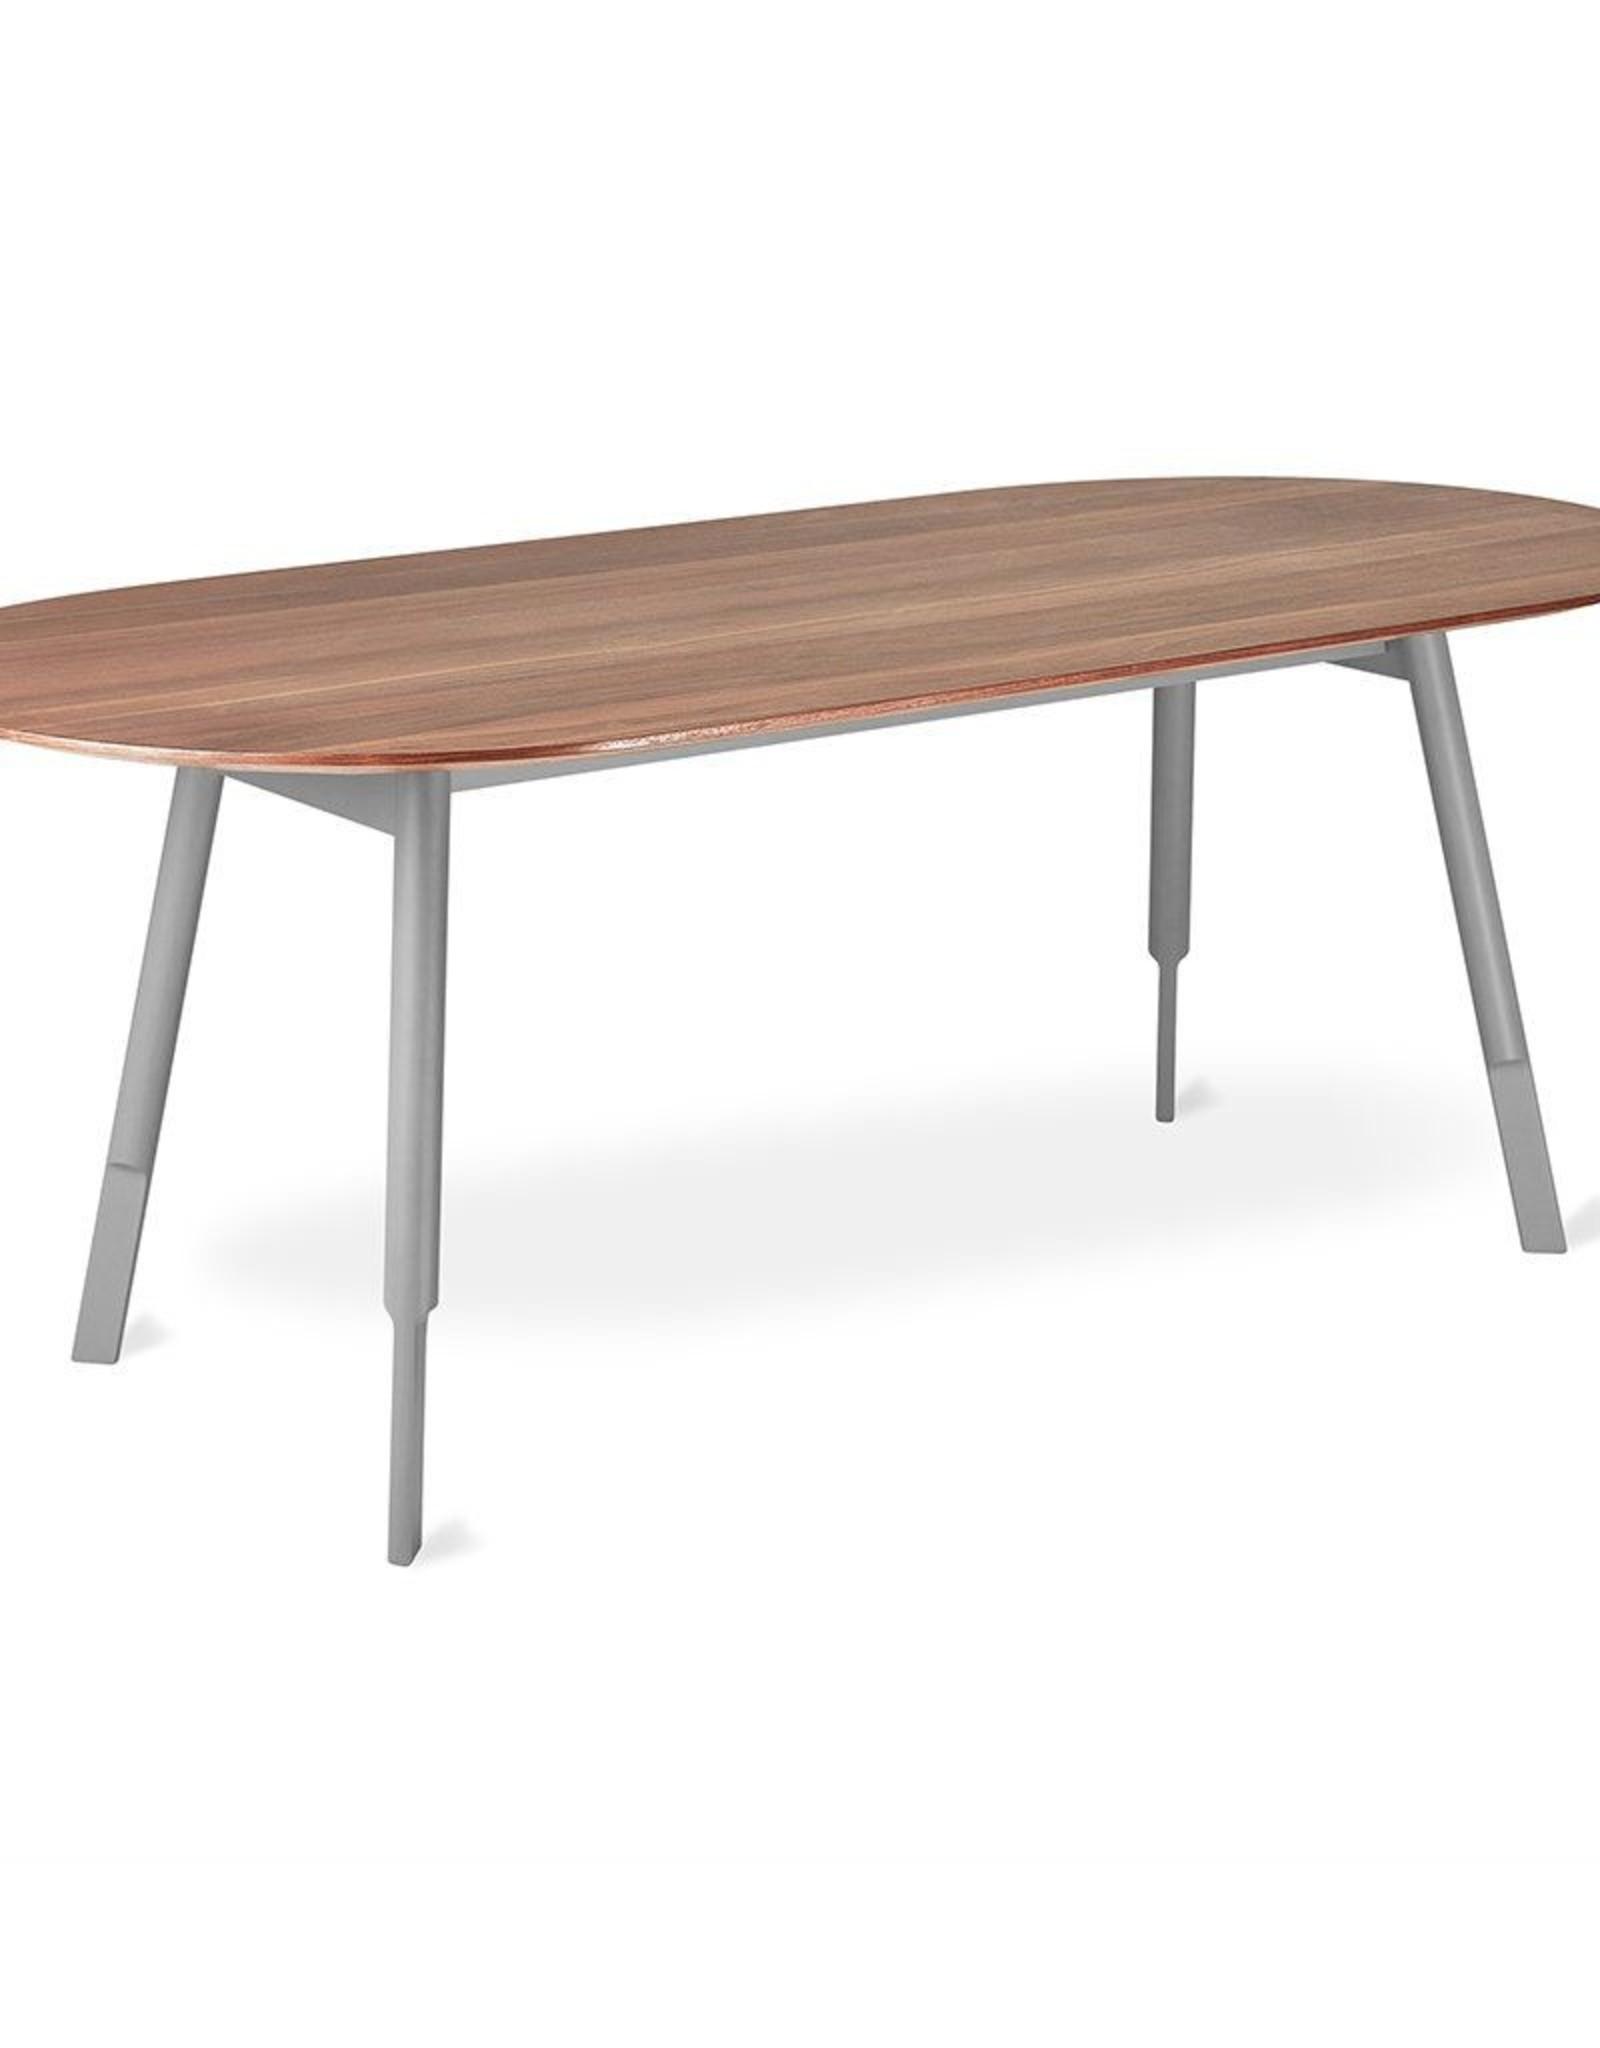 Gus* Modern Bracket Dining Table